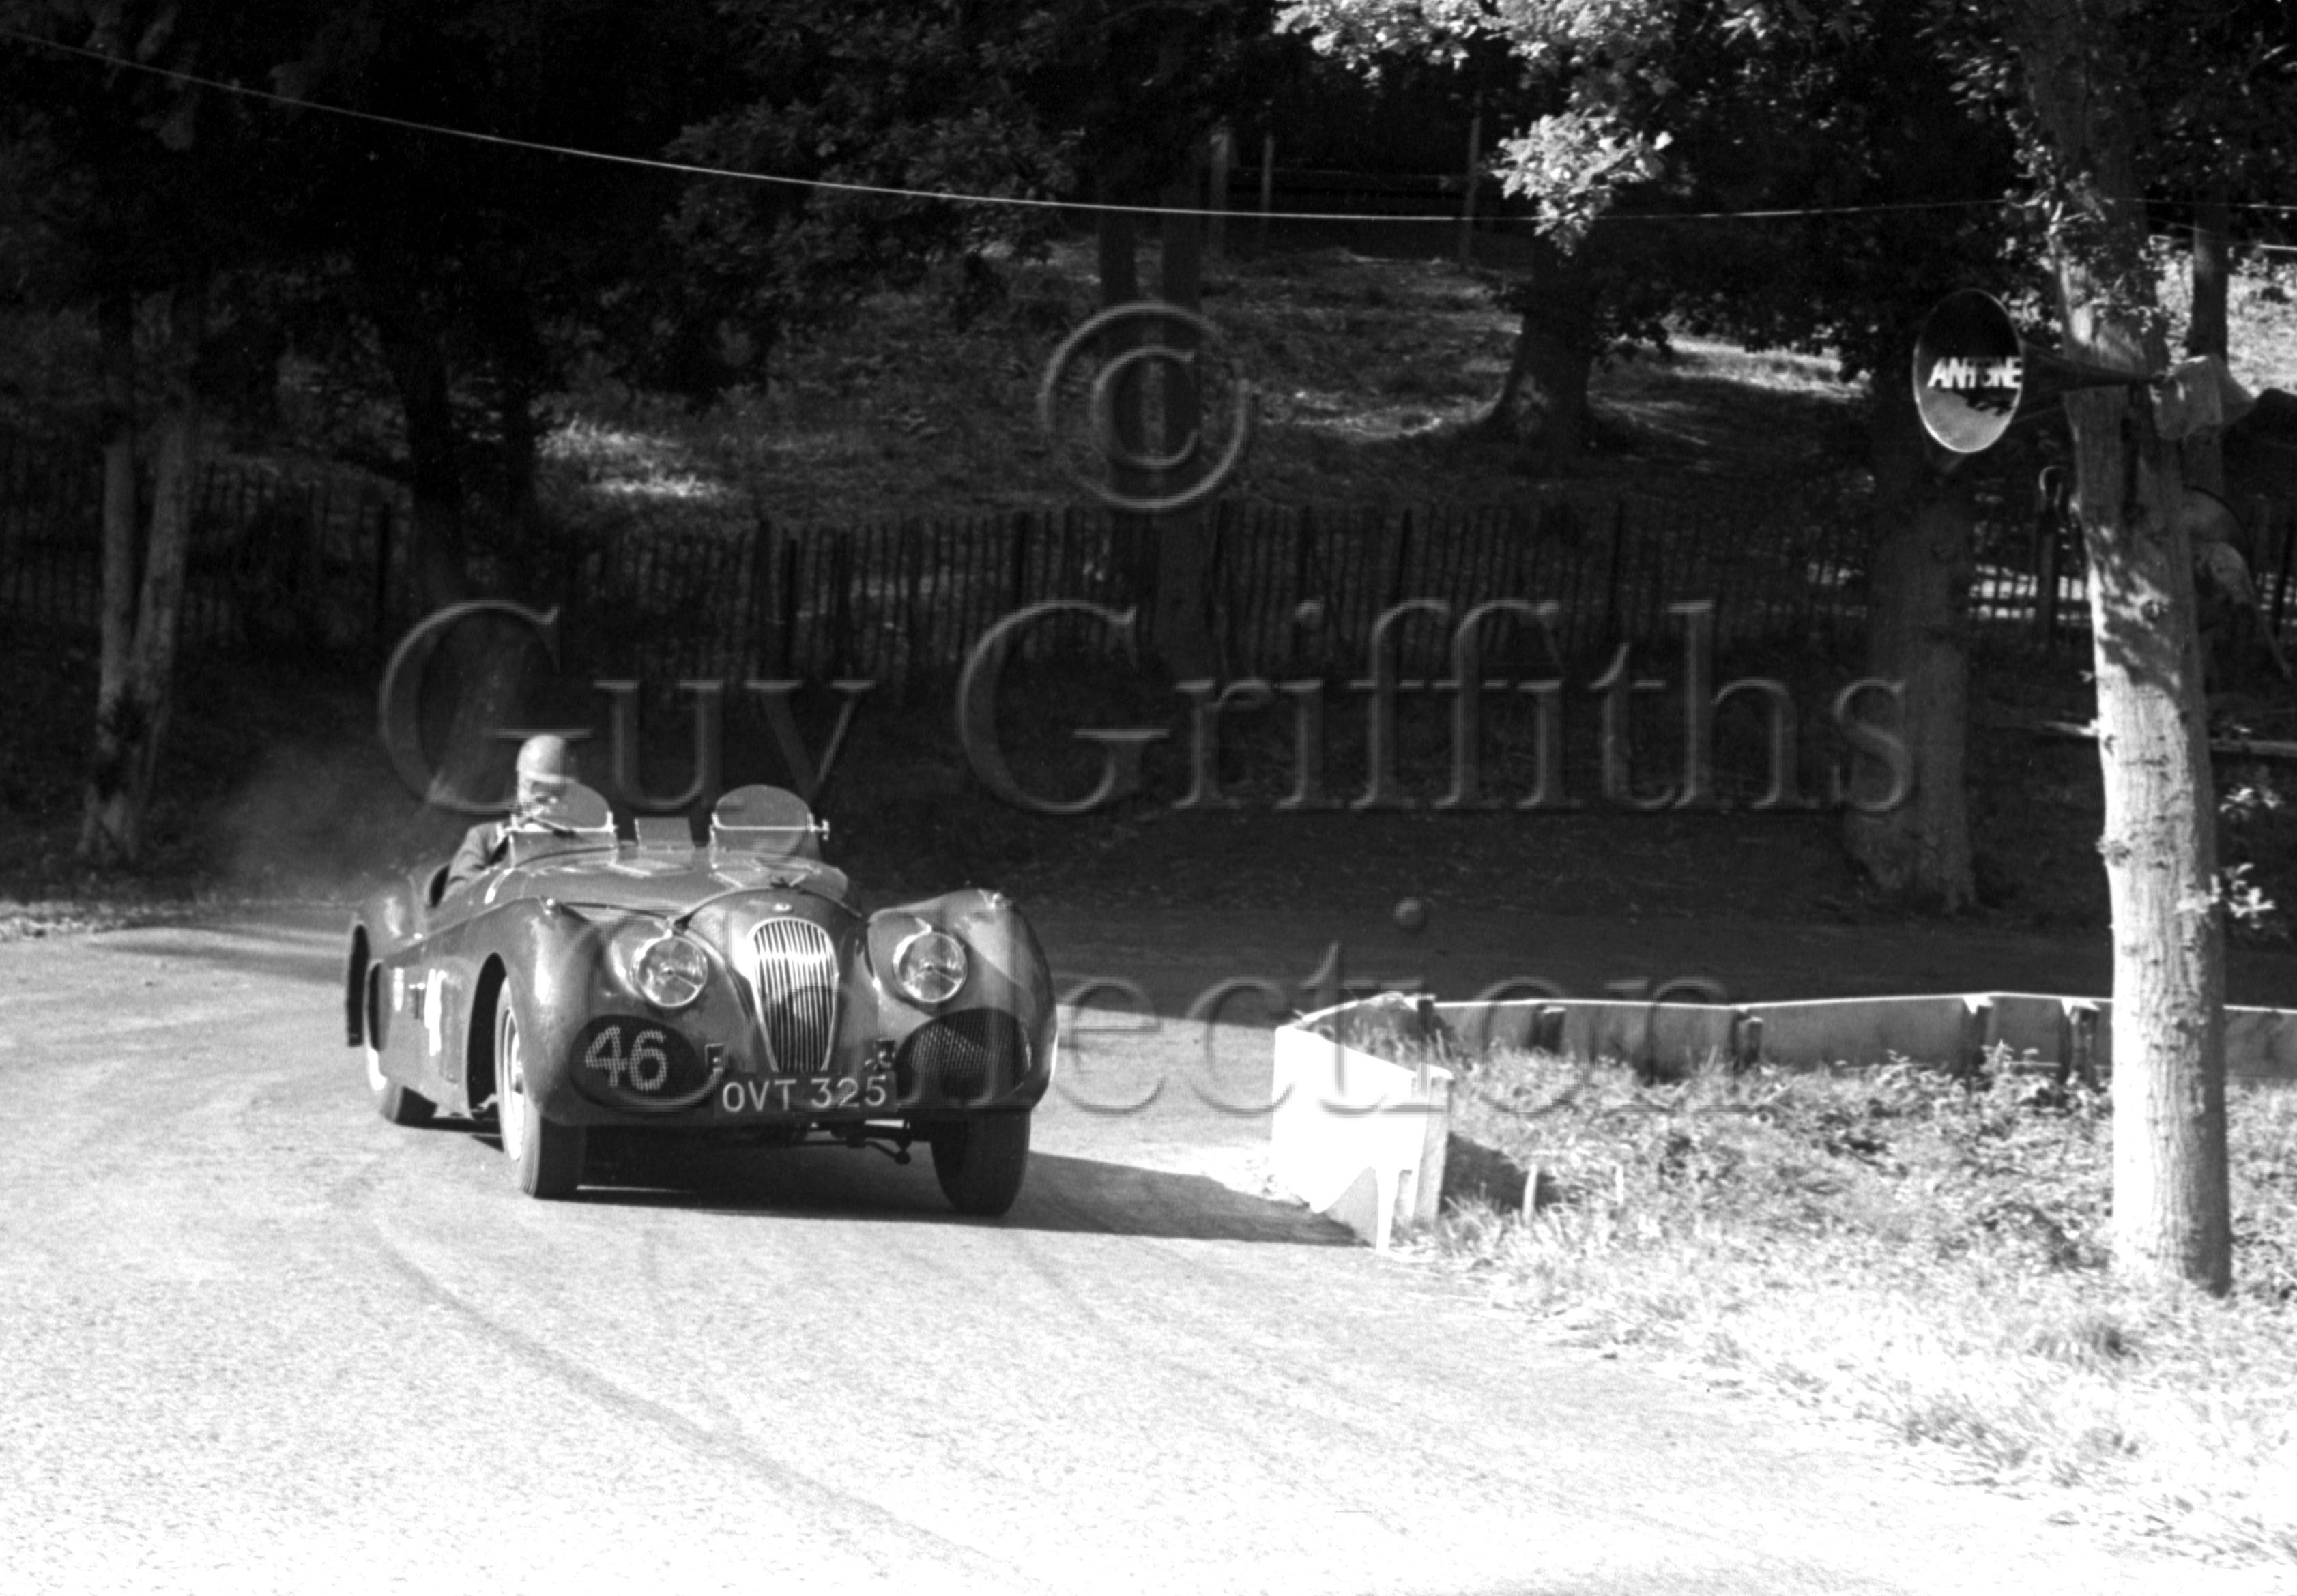 61-484–J-Swift–Jaguar-XK-120-OVT-325–Prescott–14-09-1952.jpg - Guy Griffiths Collection